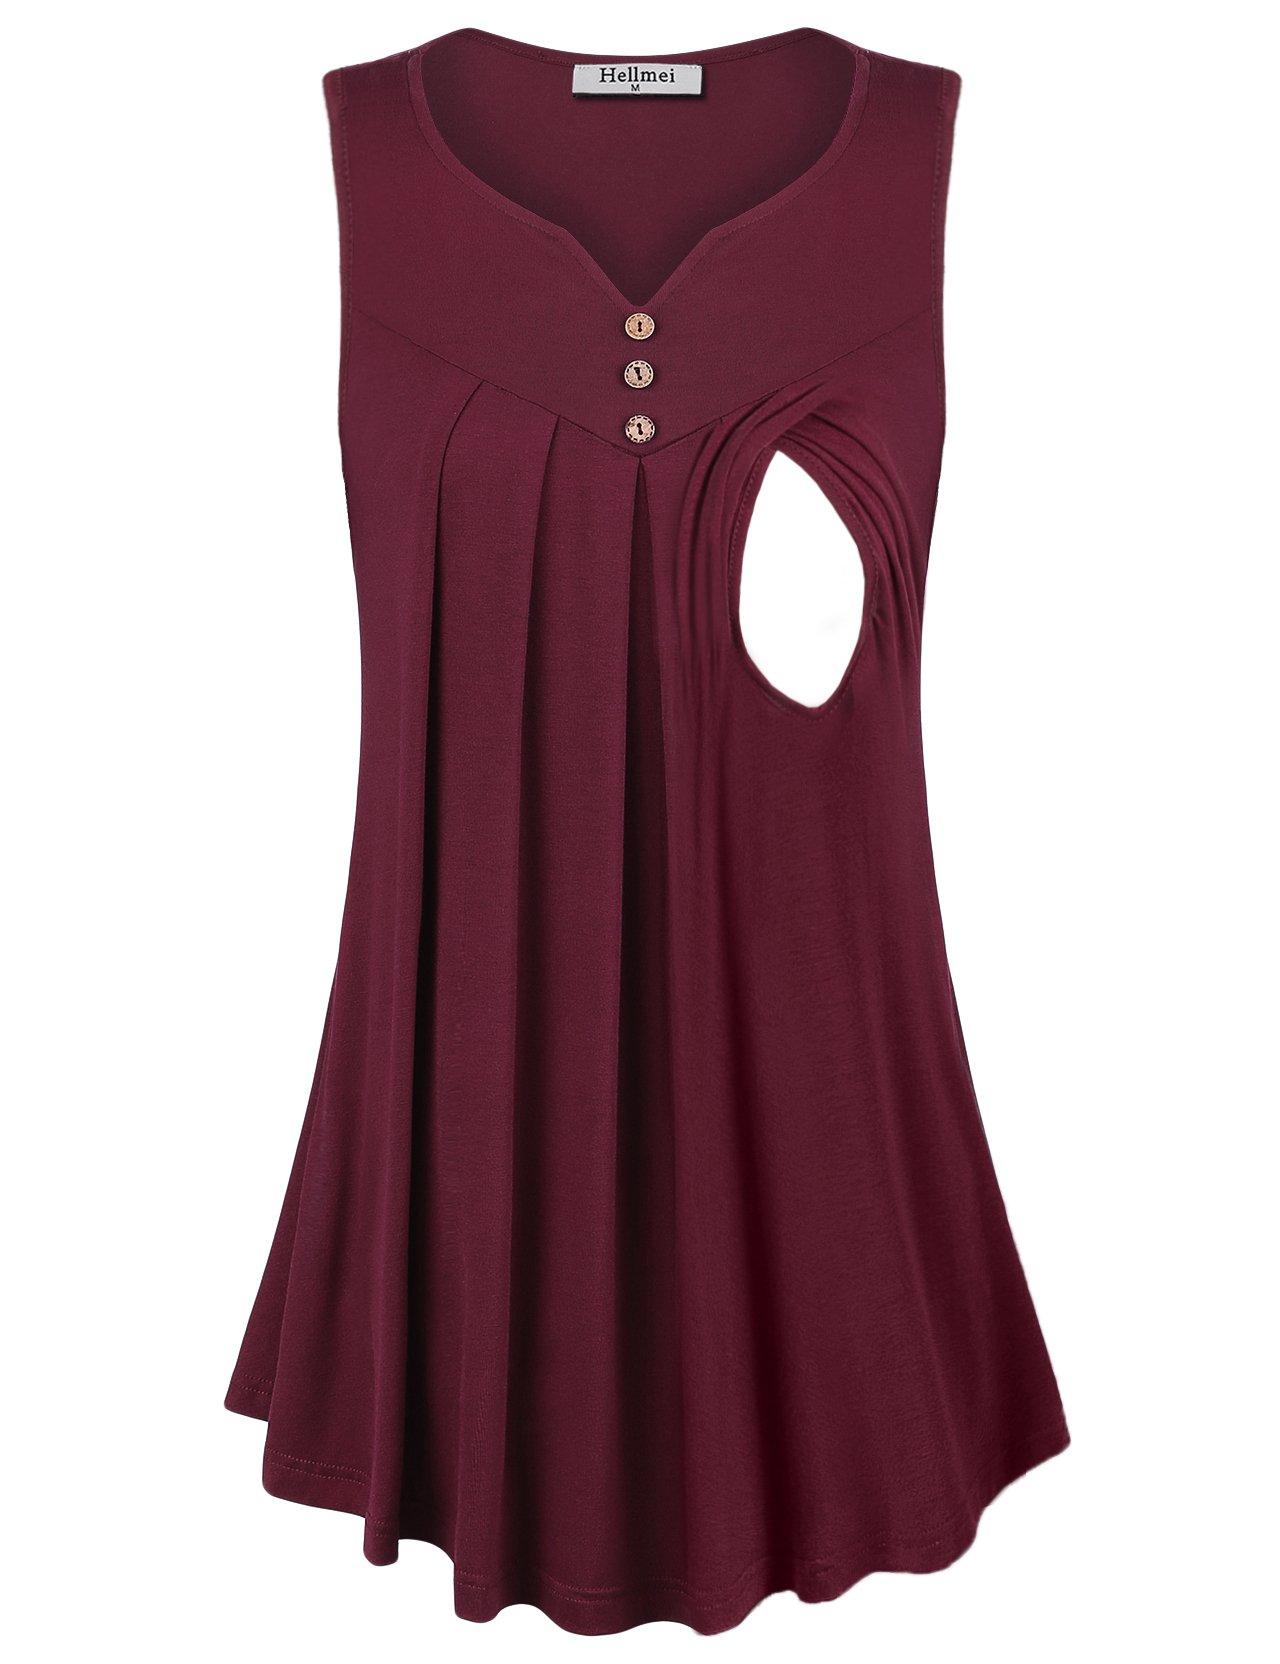 Hellmei Women's Long Sleeve Zip up Pullover Nursing Hoodies with Side Pocket (X-Large, Wine#10)